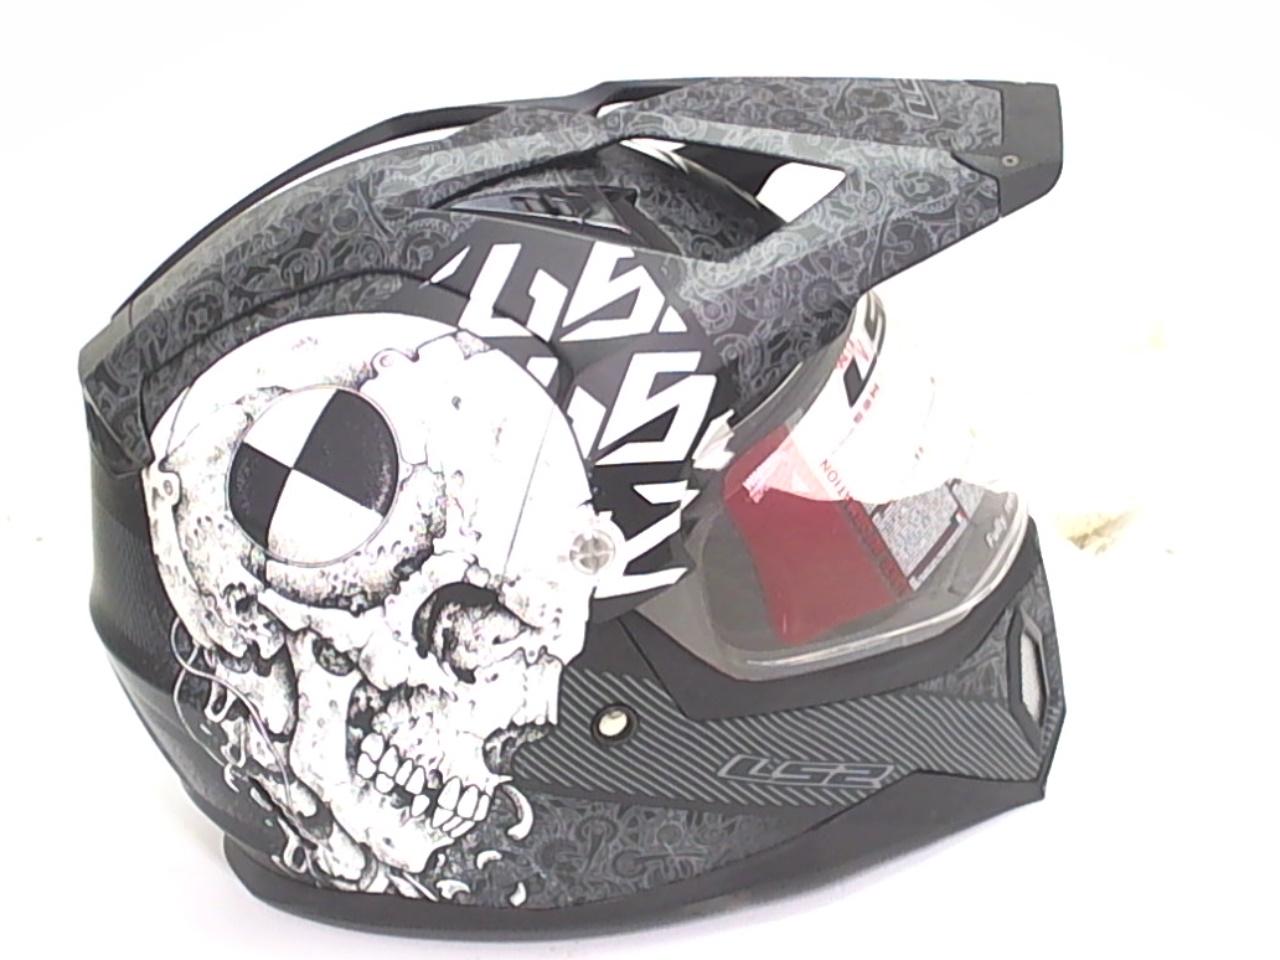 ls2 mx453 test machine mens motorcycle helmet black size s. Black Bedroom Furniture Sets. Home Design Ideas